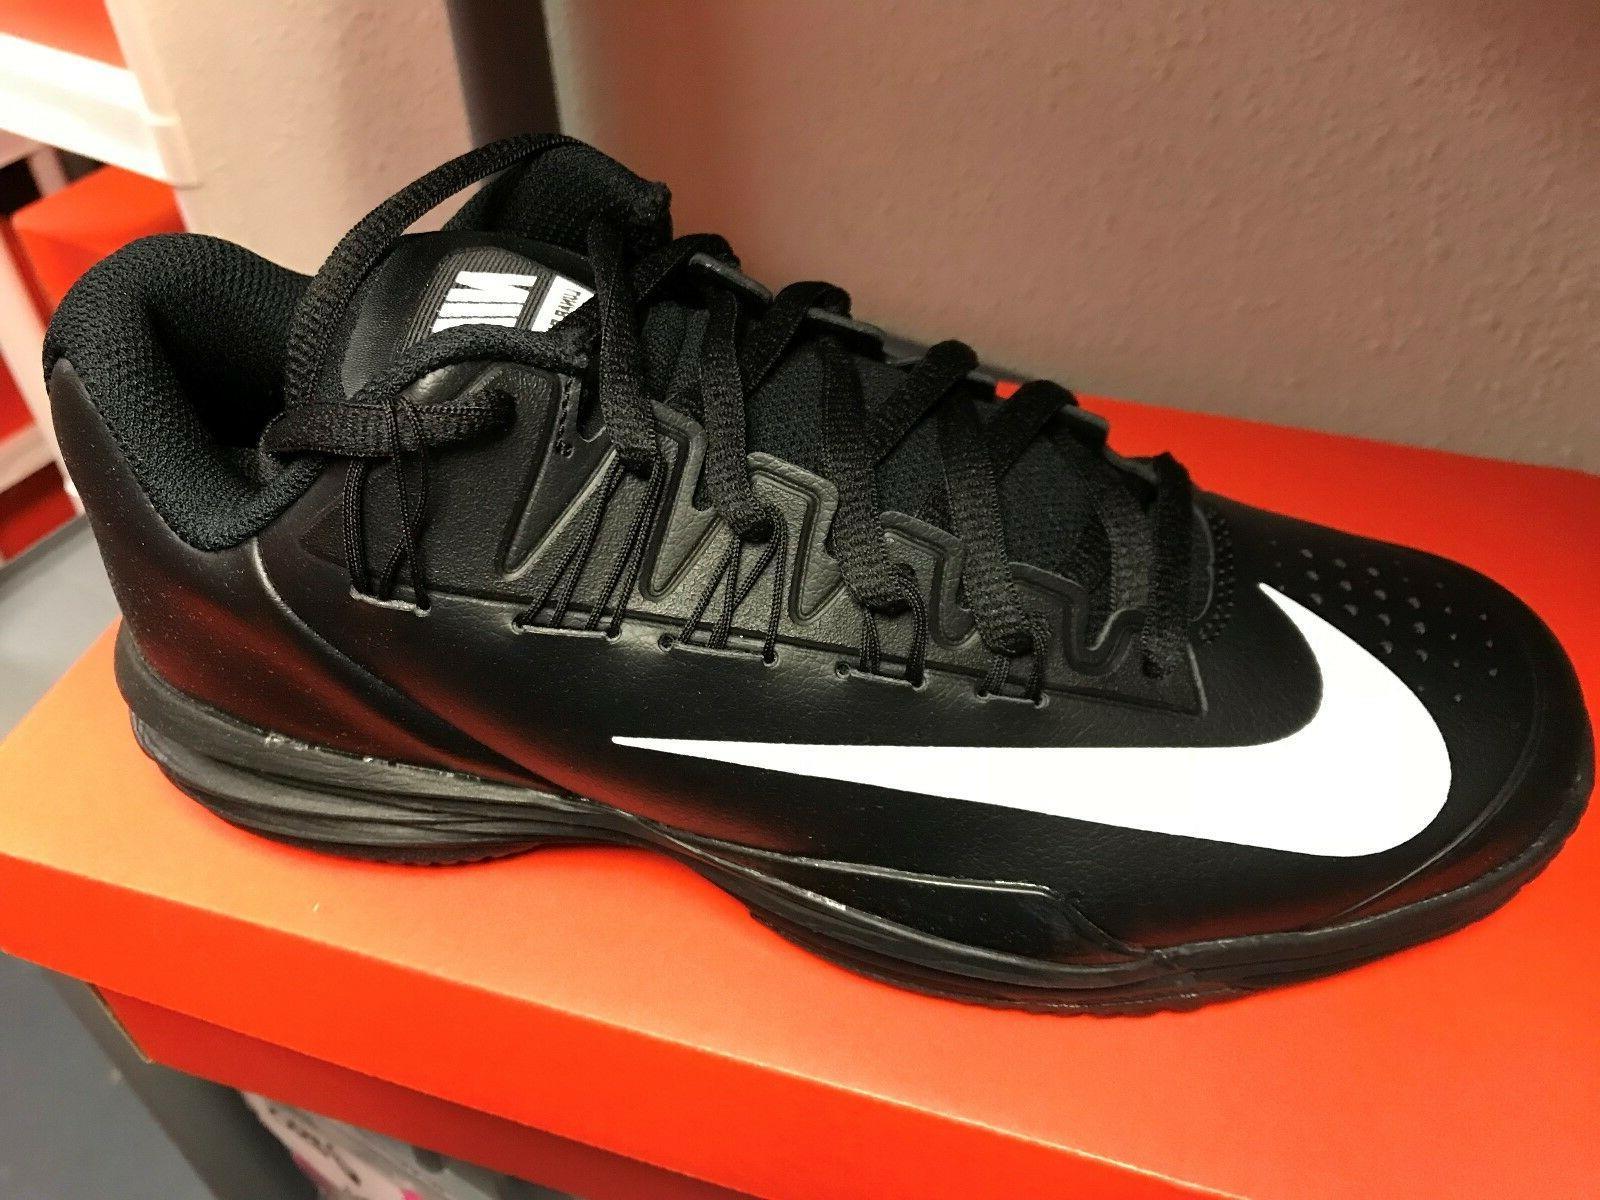 Nike Men's Lunar Ballistec 1.5 Tennis Shoe Style 705285001